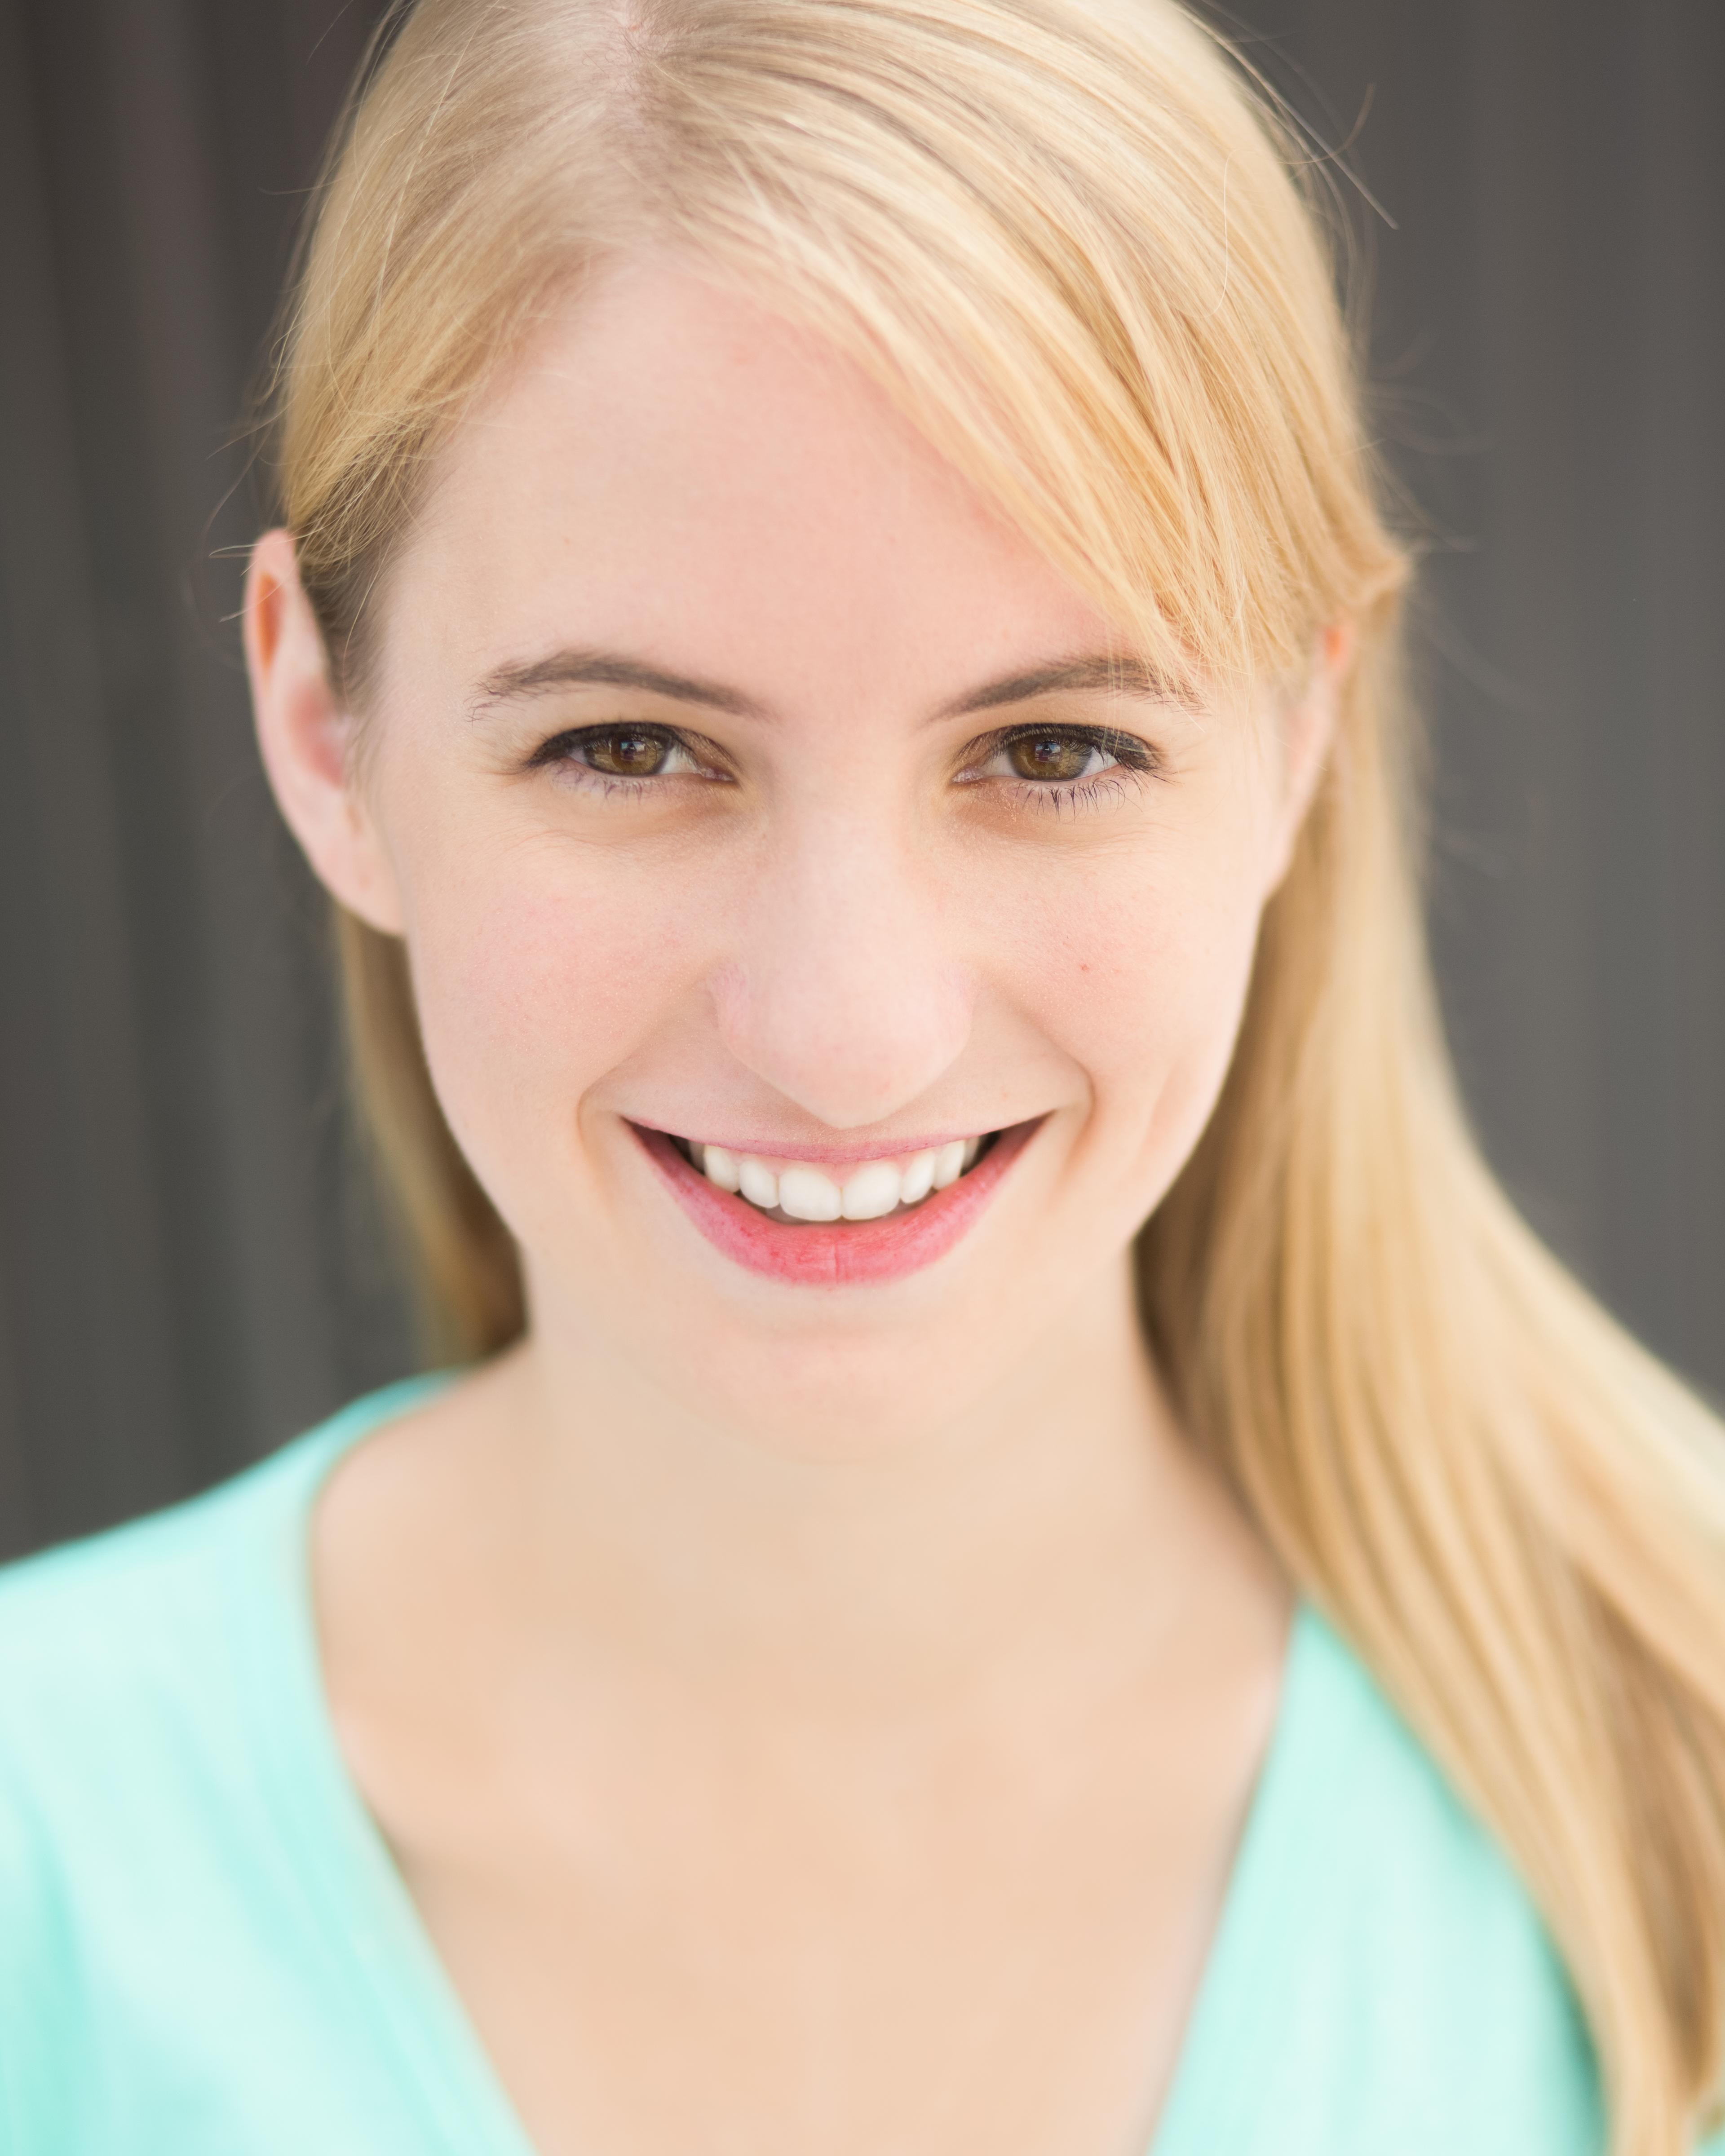 Actress: Corley